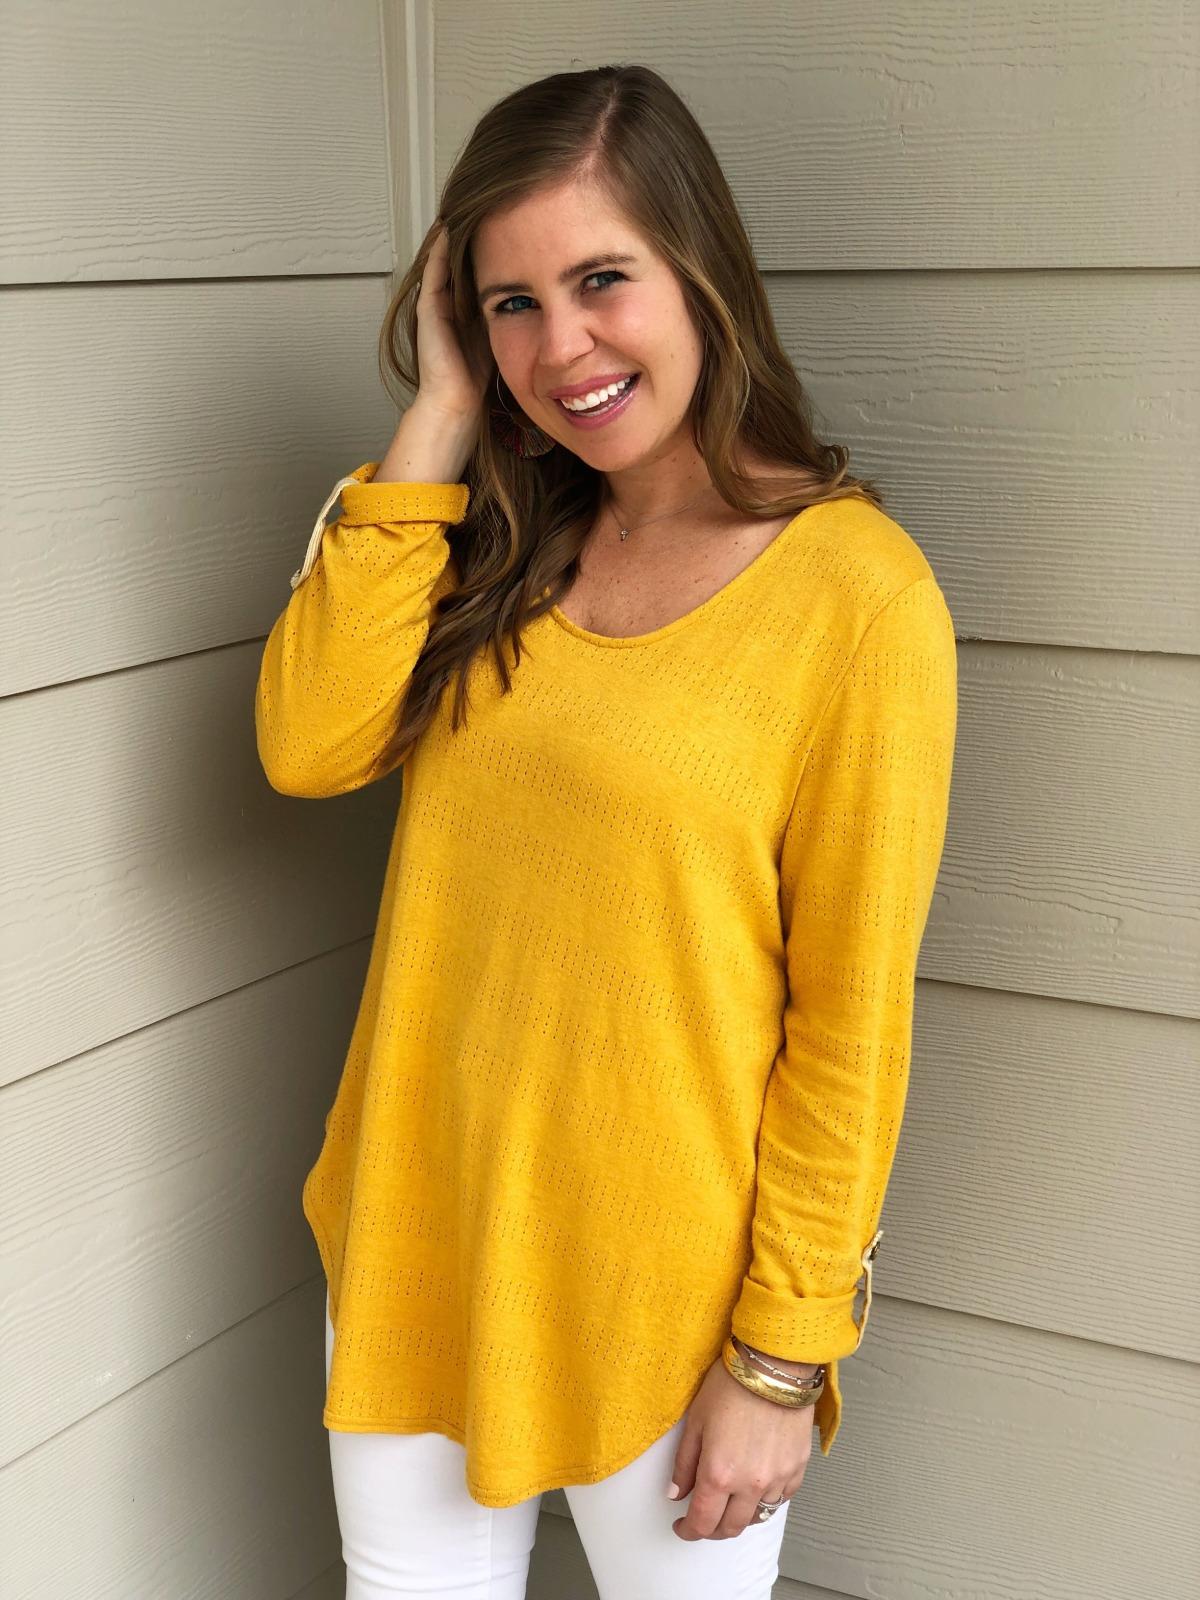 Haley: Fashion and LifestyleBlogger